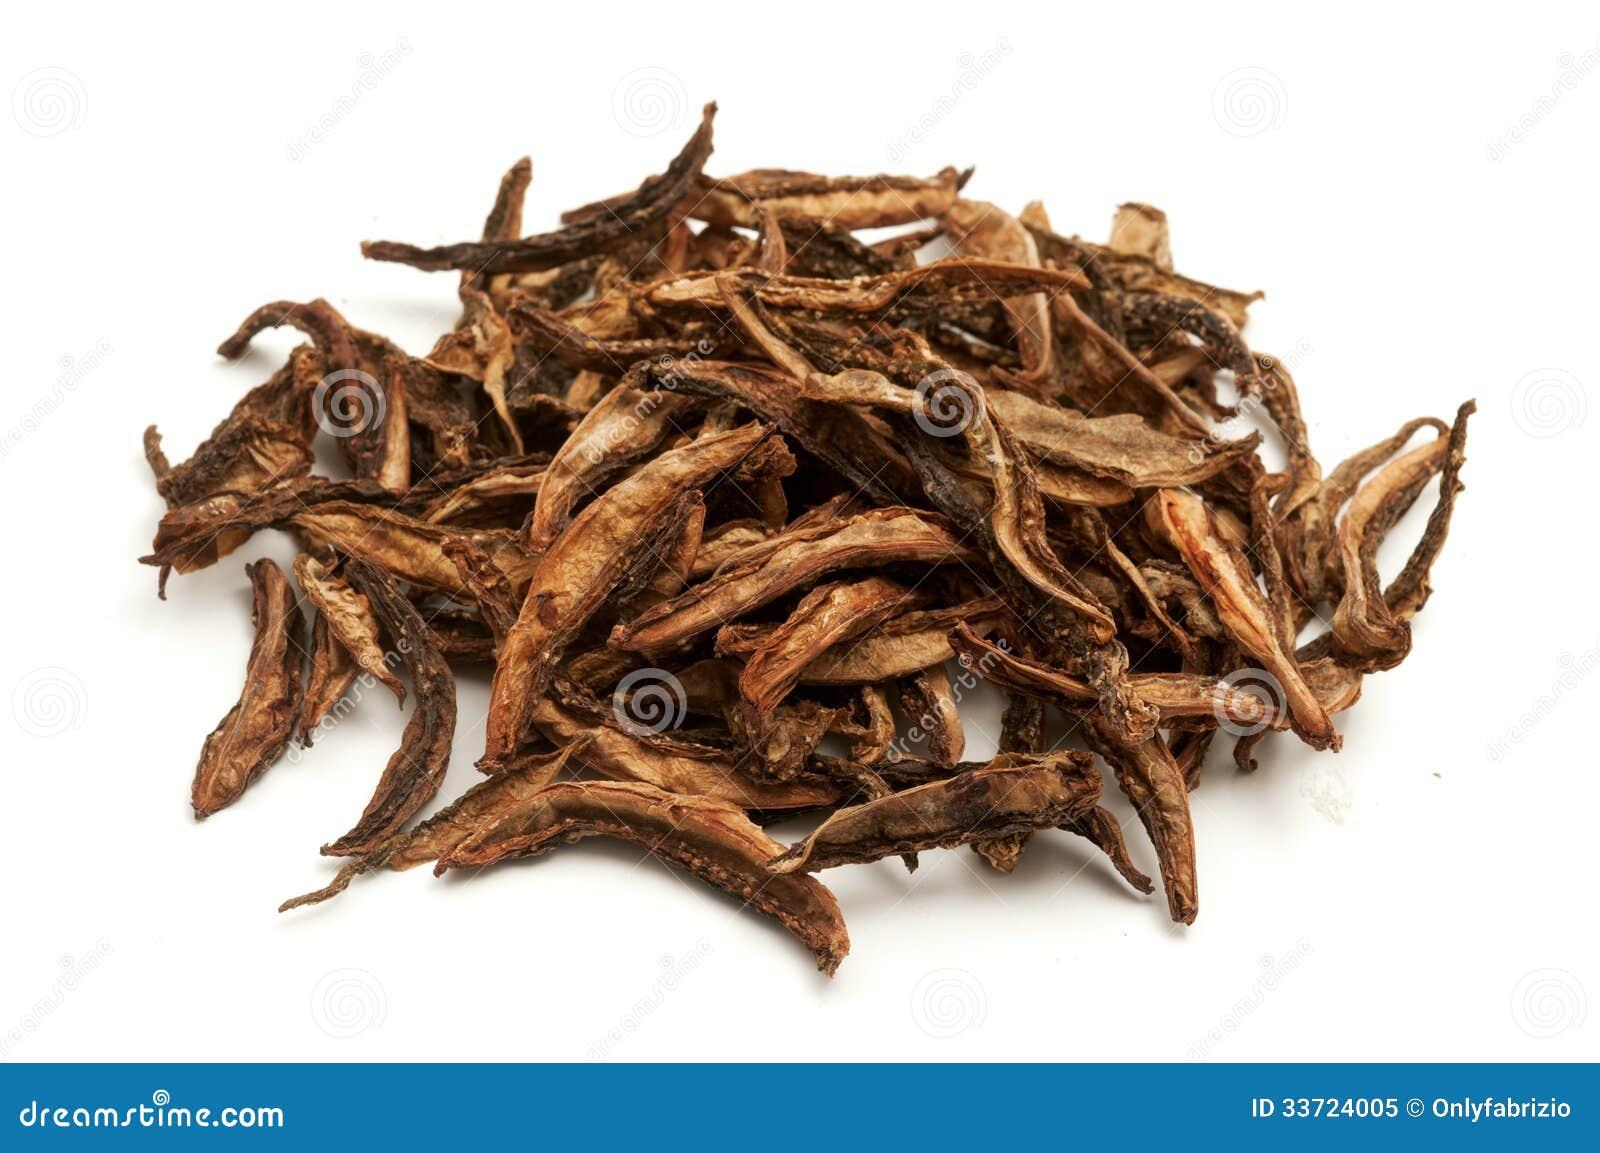 how to make dried kamias